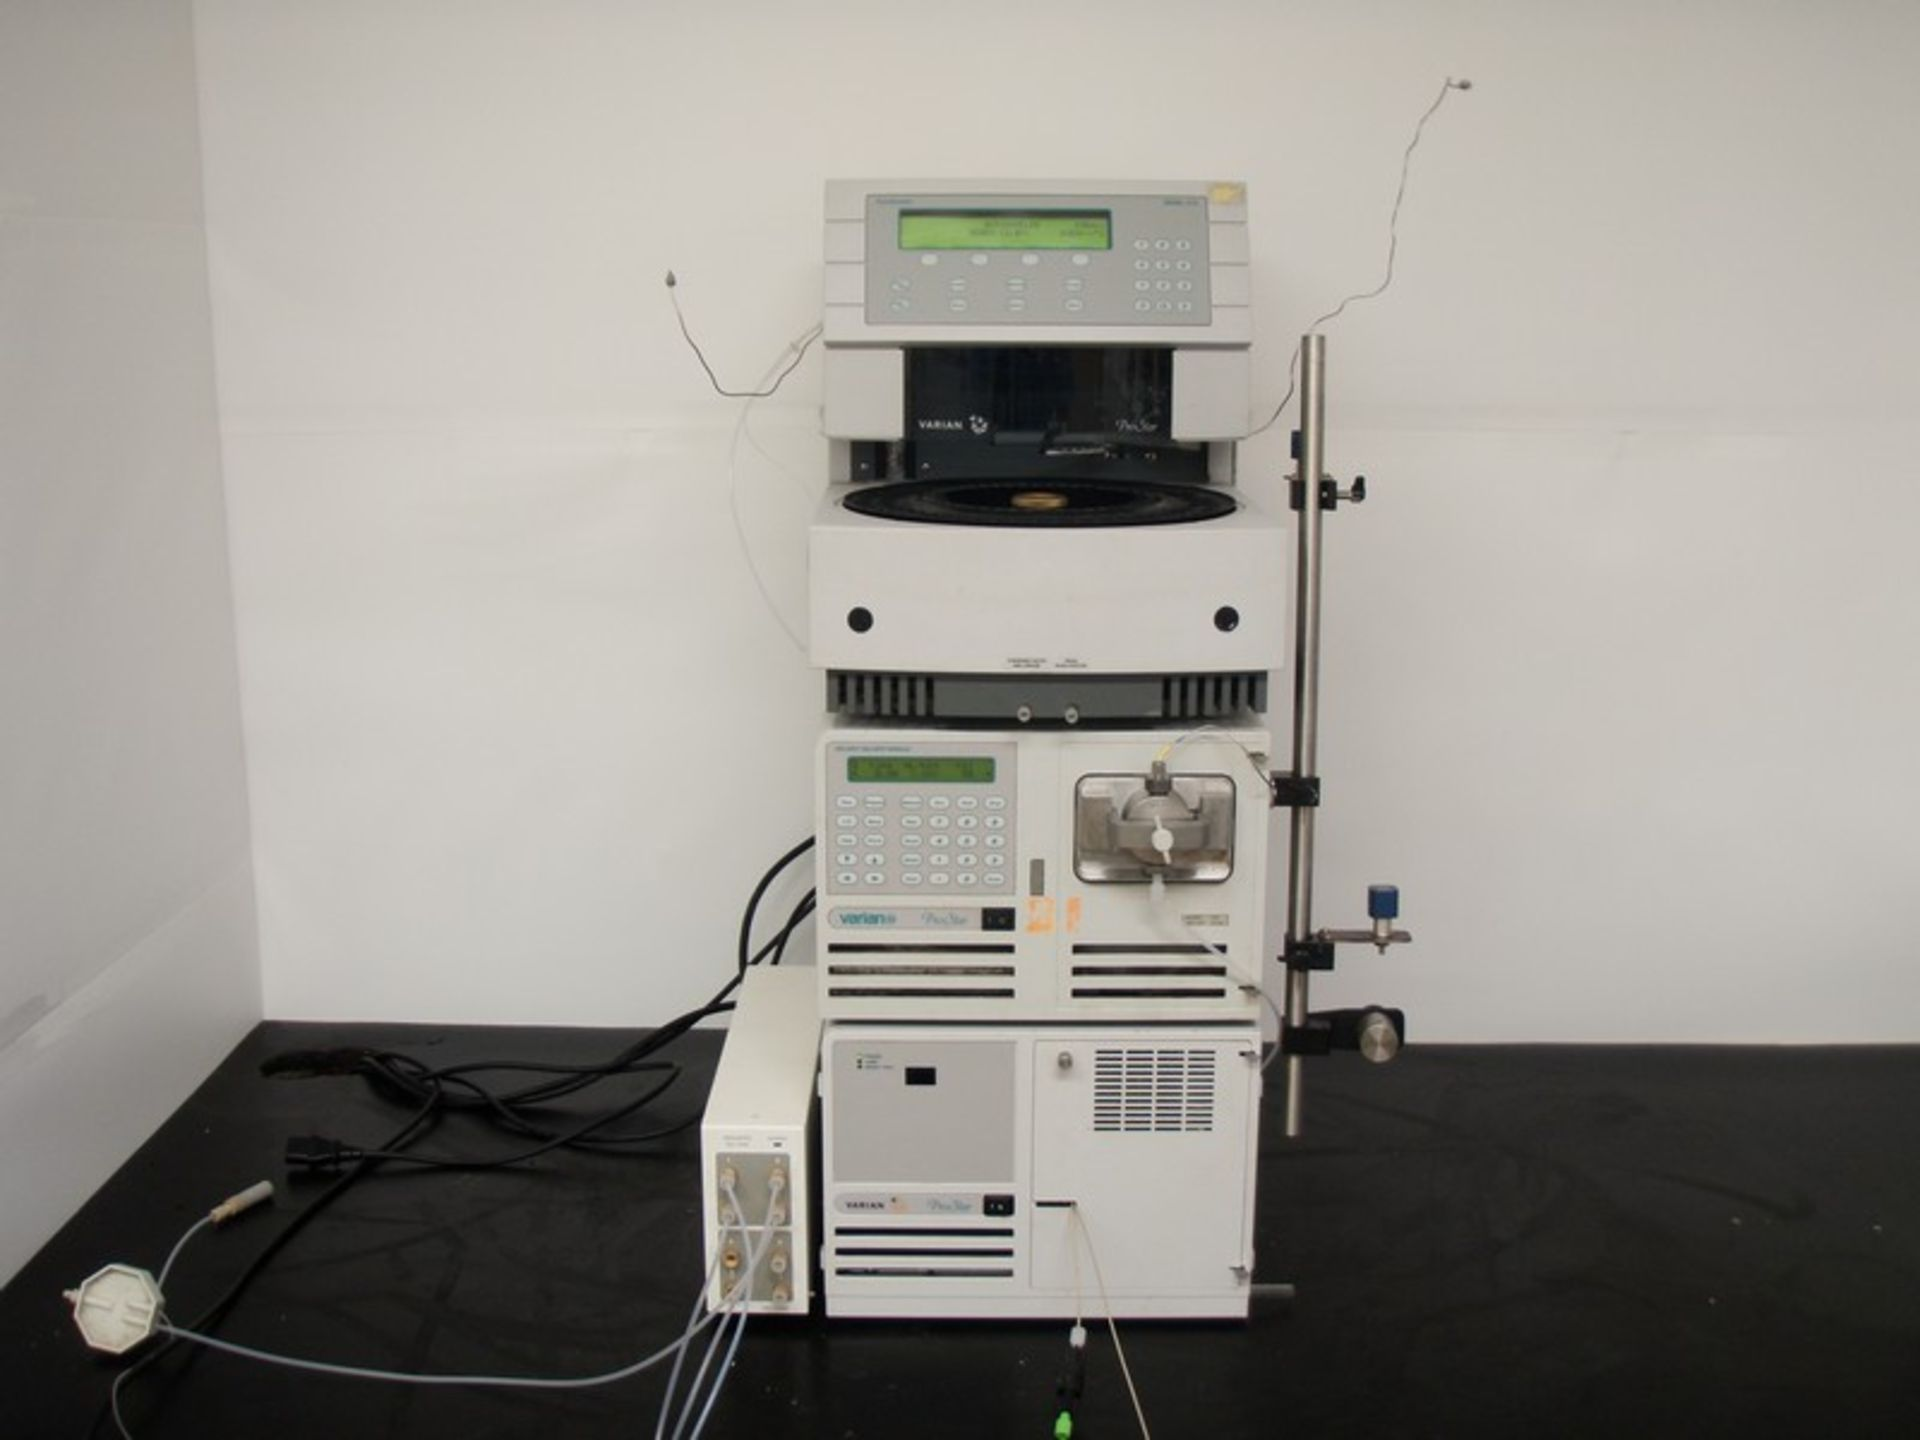 Lot 236 - Varian ProStar HPLC consisting of Autosampler Model 410, Pump Model 210, UV-Vis Detector Model